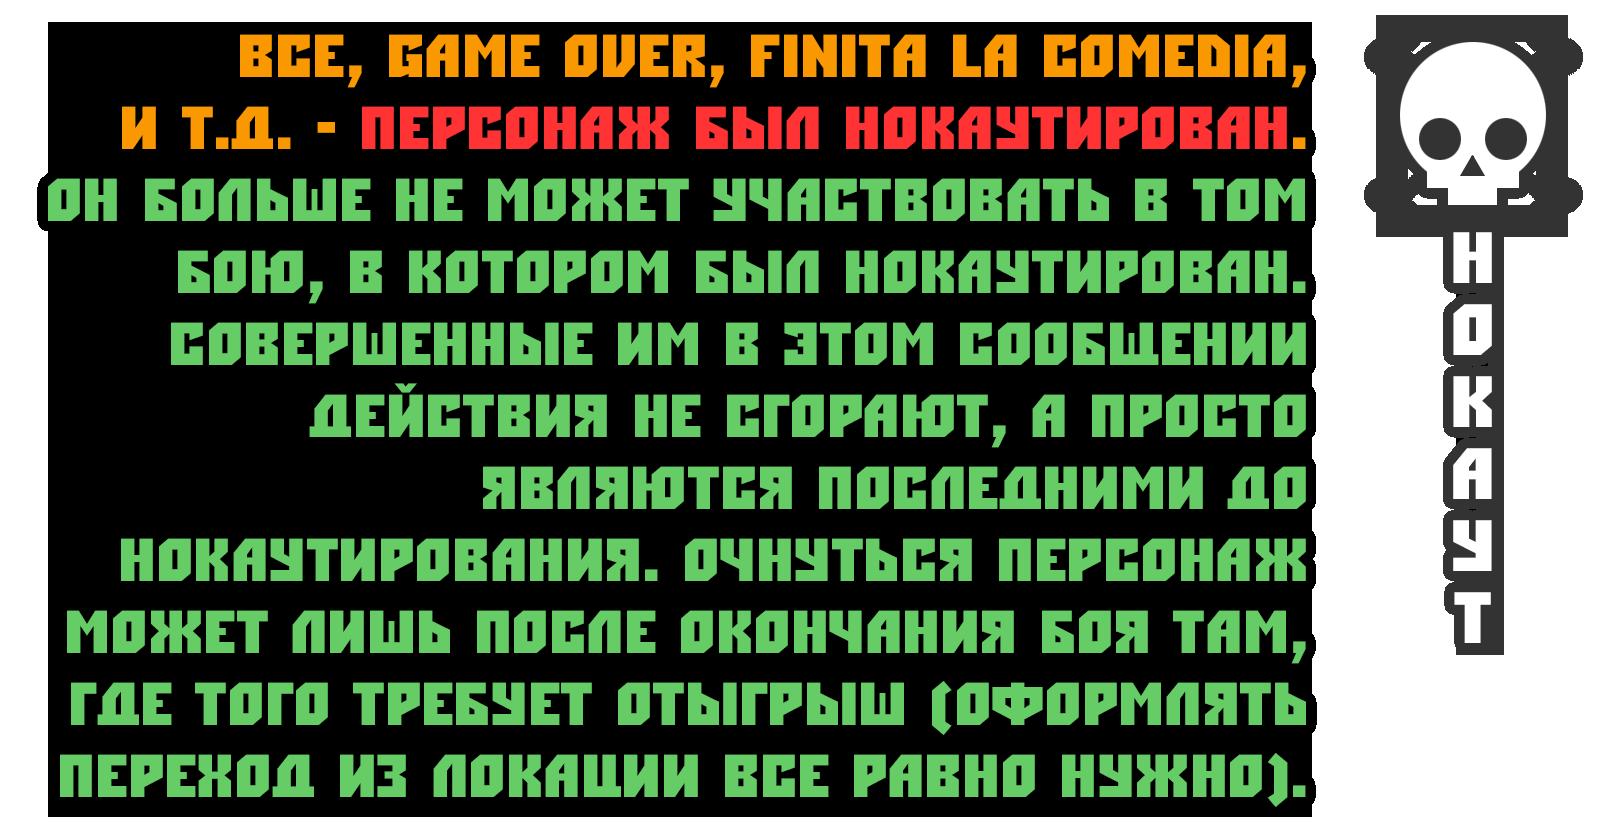 Тест боевой системы O4ki_Urona_Noukaut_Forum_Vova_2